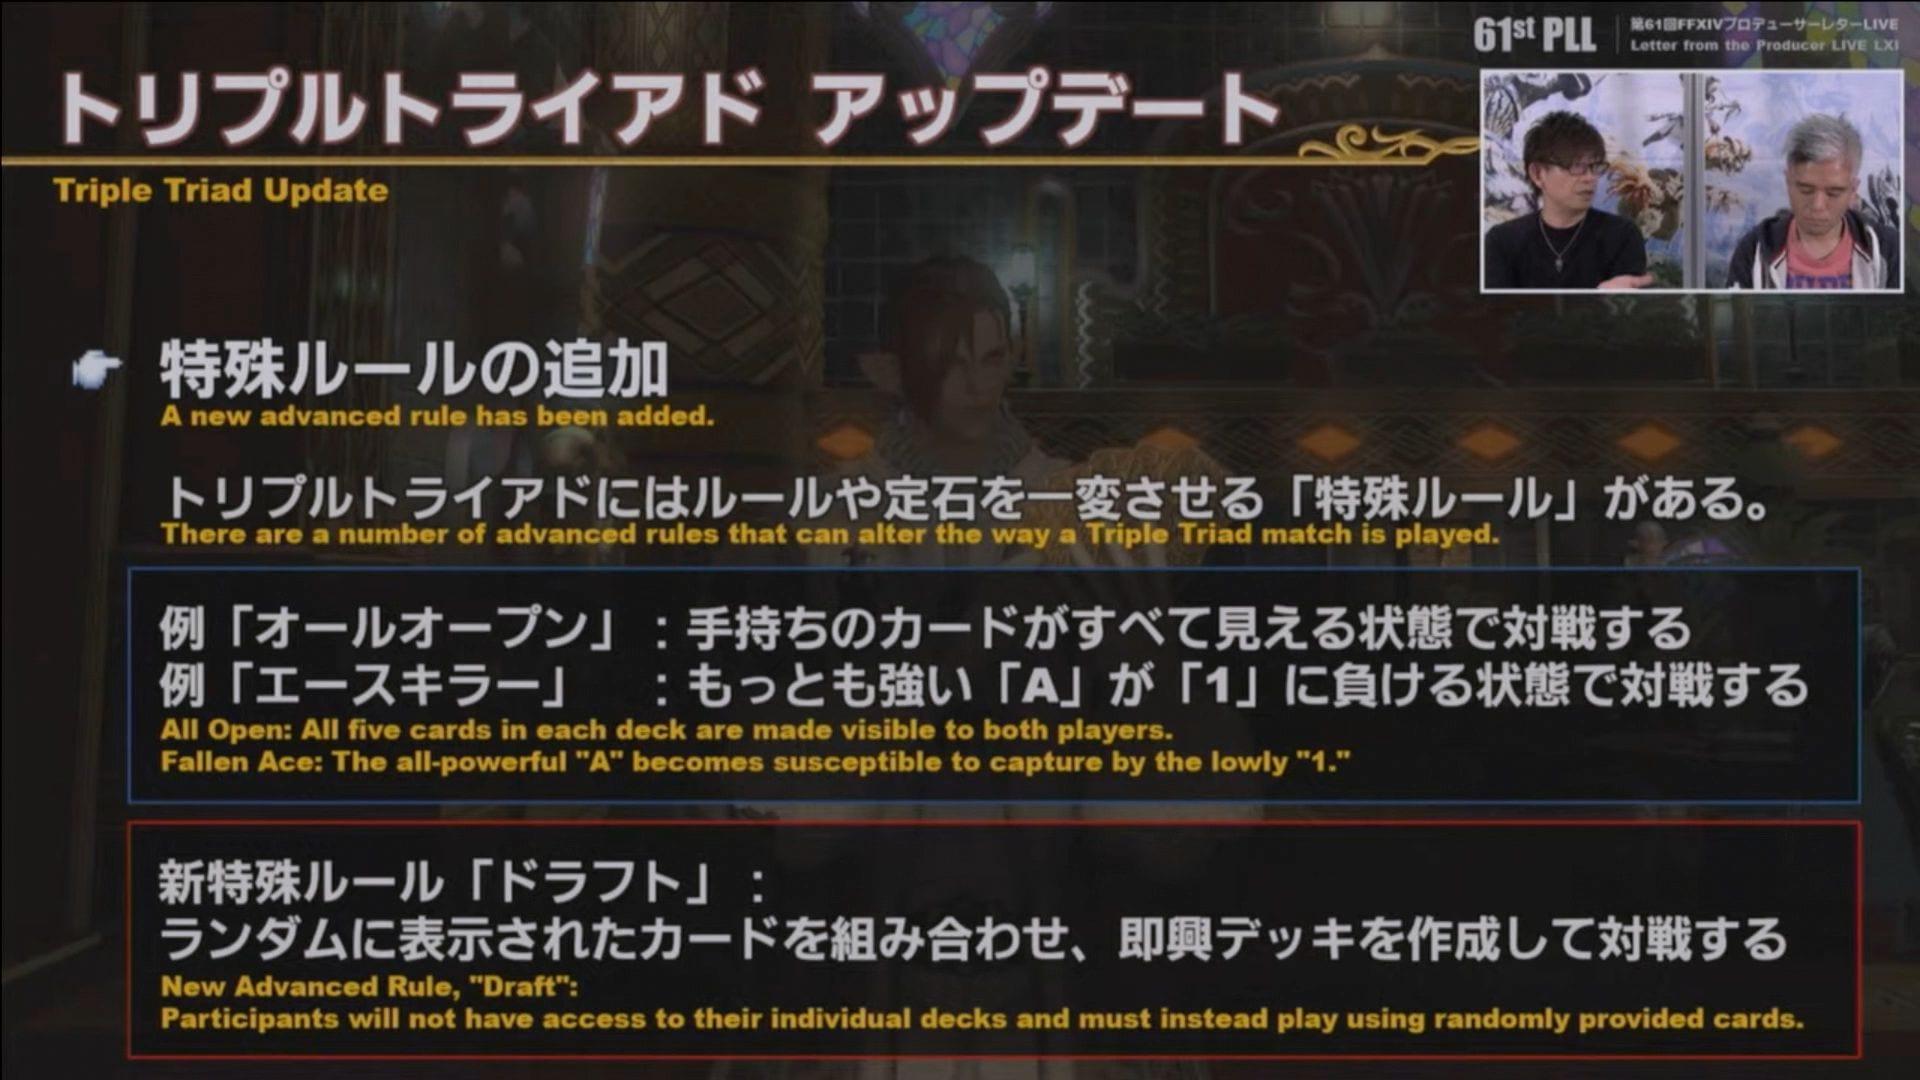 Final-Fantasy-XIV-Screenshot-2020-11-27-13-59-51.jpg?ssl=1